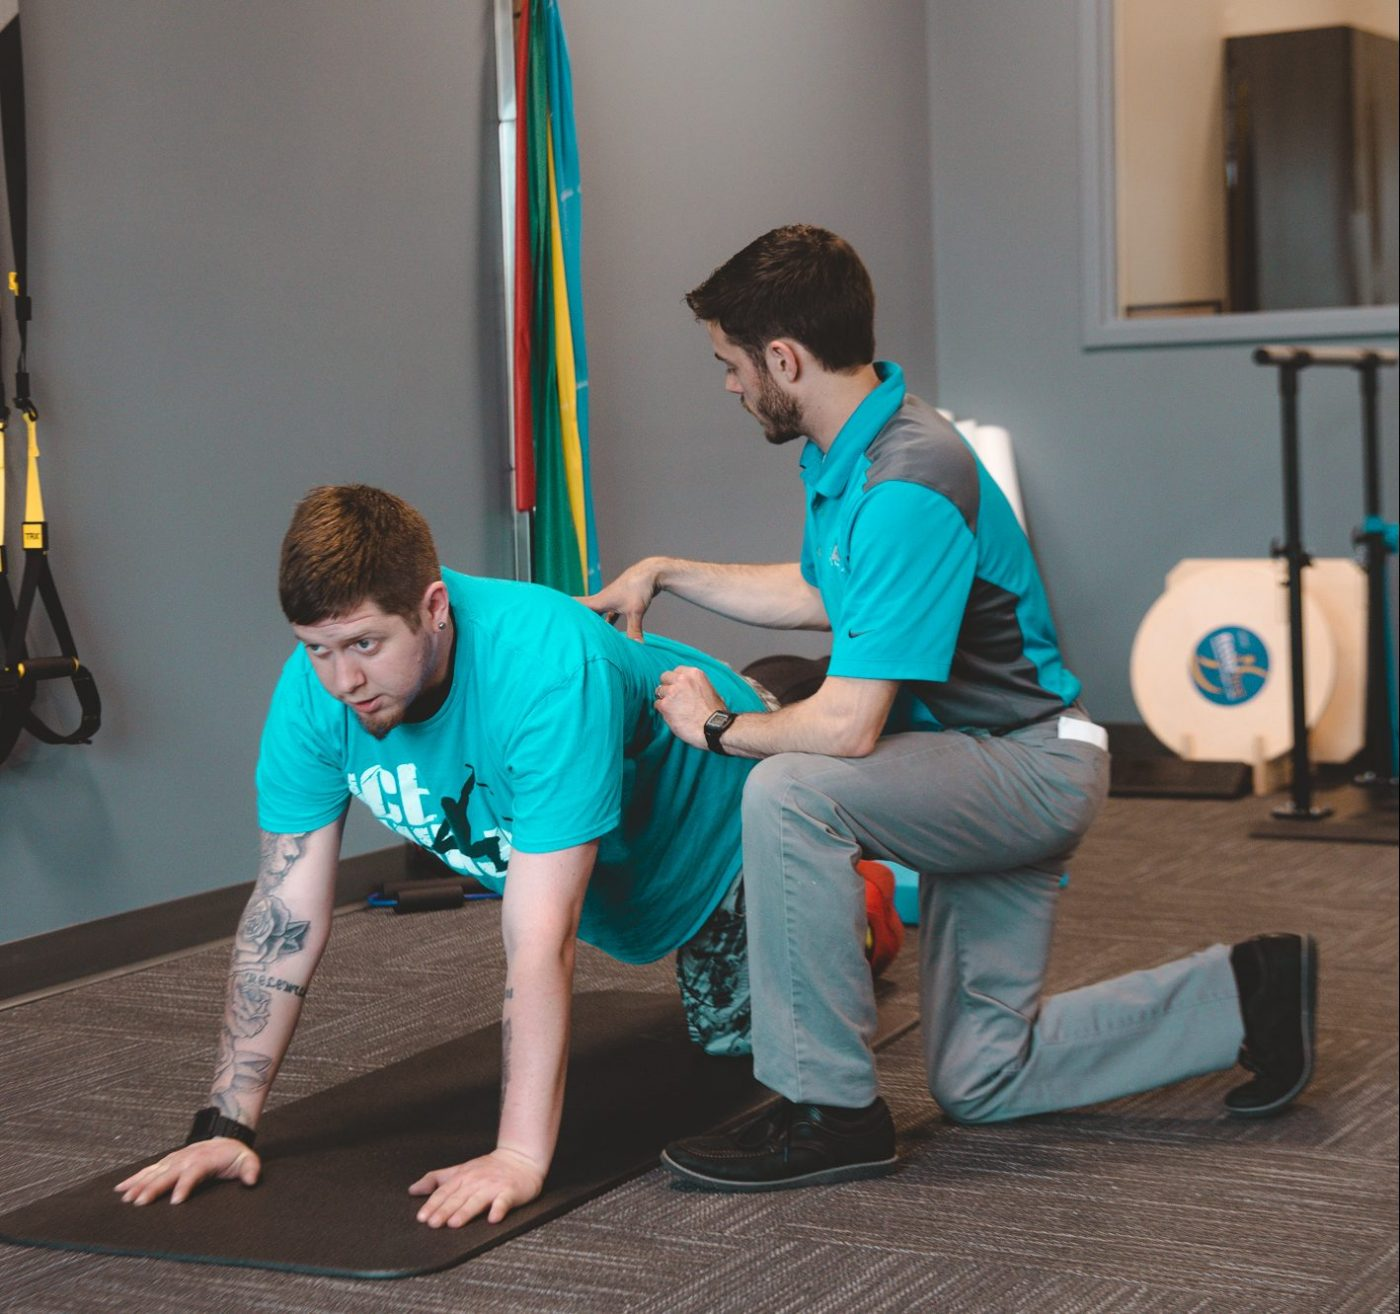 Therapist working on floor with patient